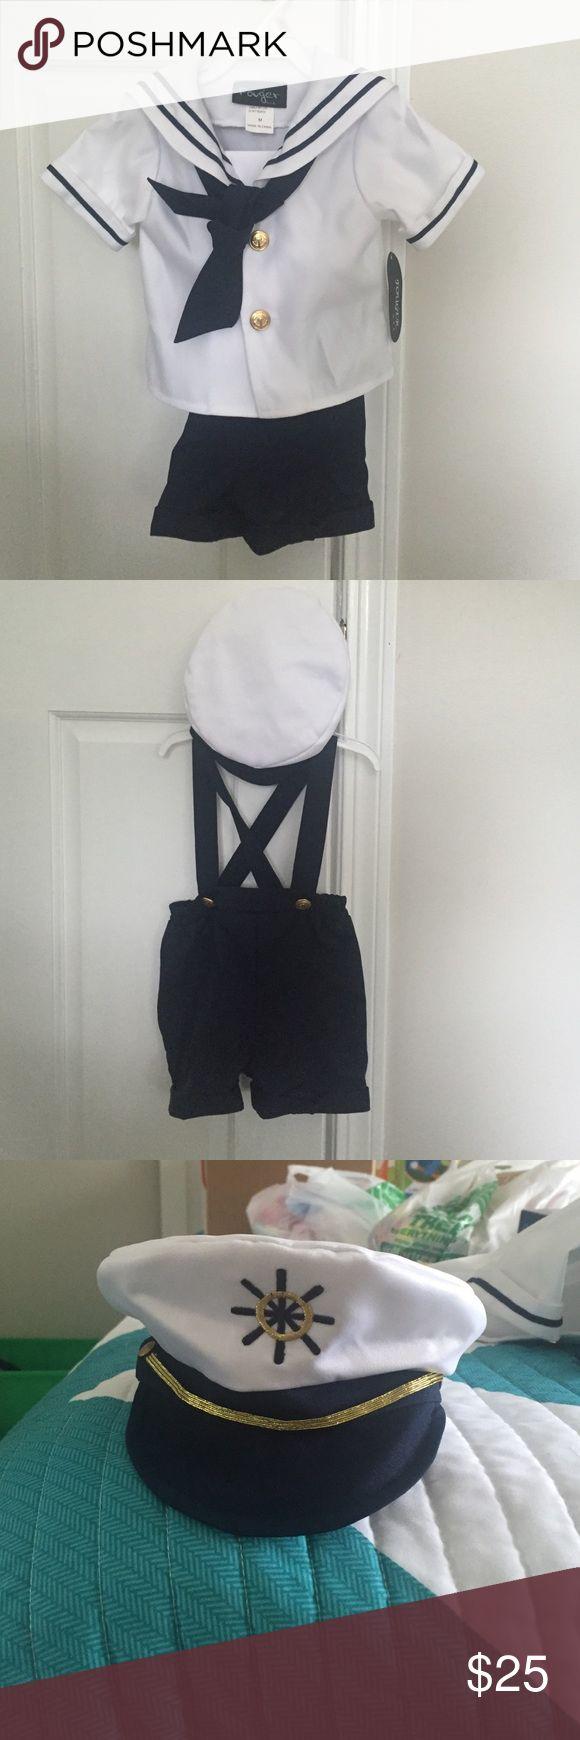 Sailor Halloween Costume Size: Medium, brand new/never worn Costumes Halloween